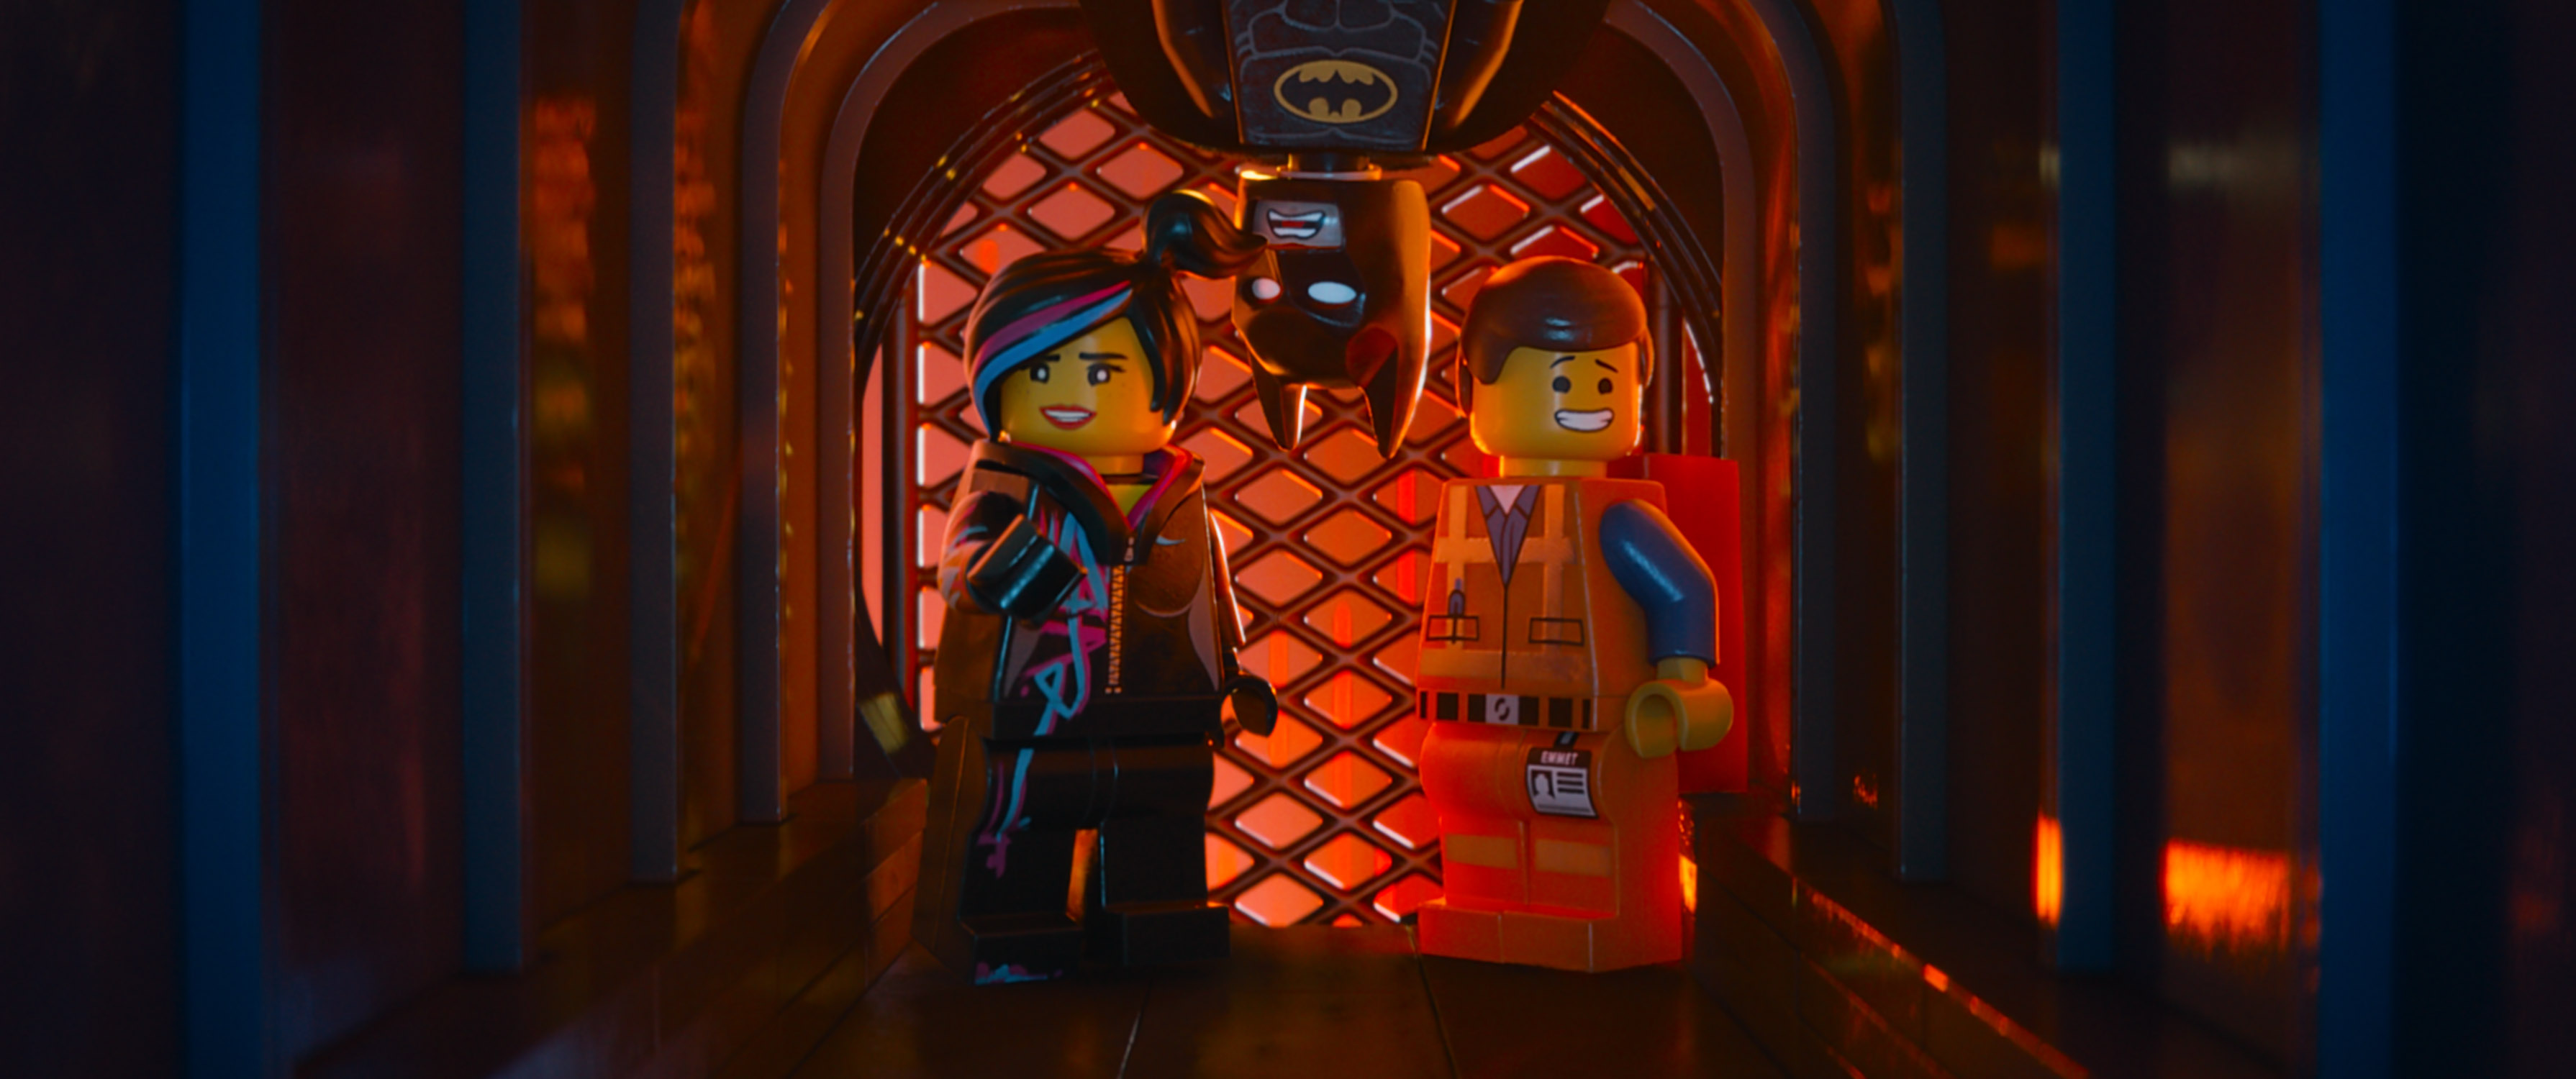 Peanuts Wallpaper Fall Las 10 Mejores Pel 237 Culas Del 2014 Seg 250 N Dave Cinergetica